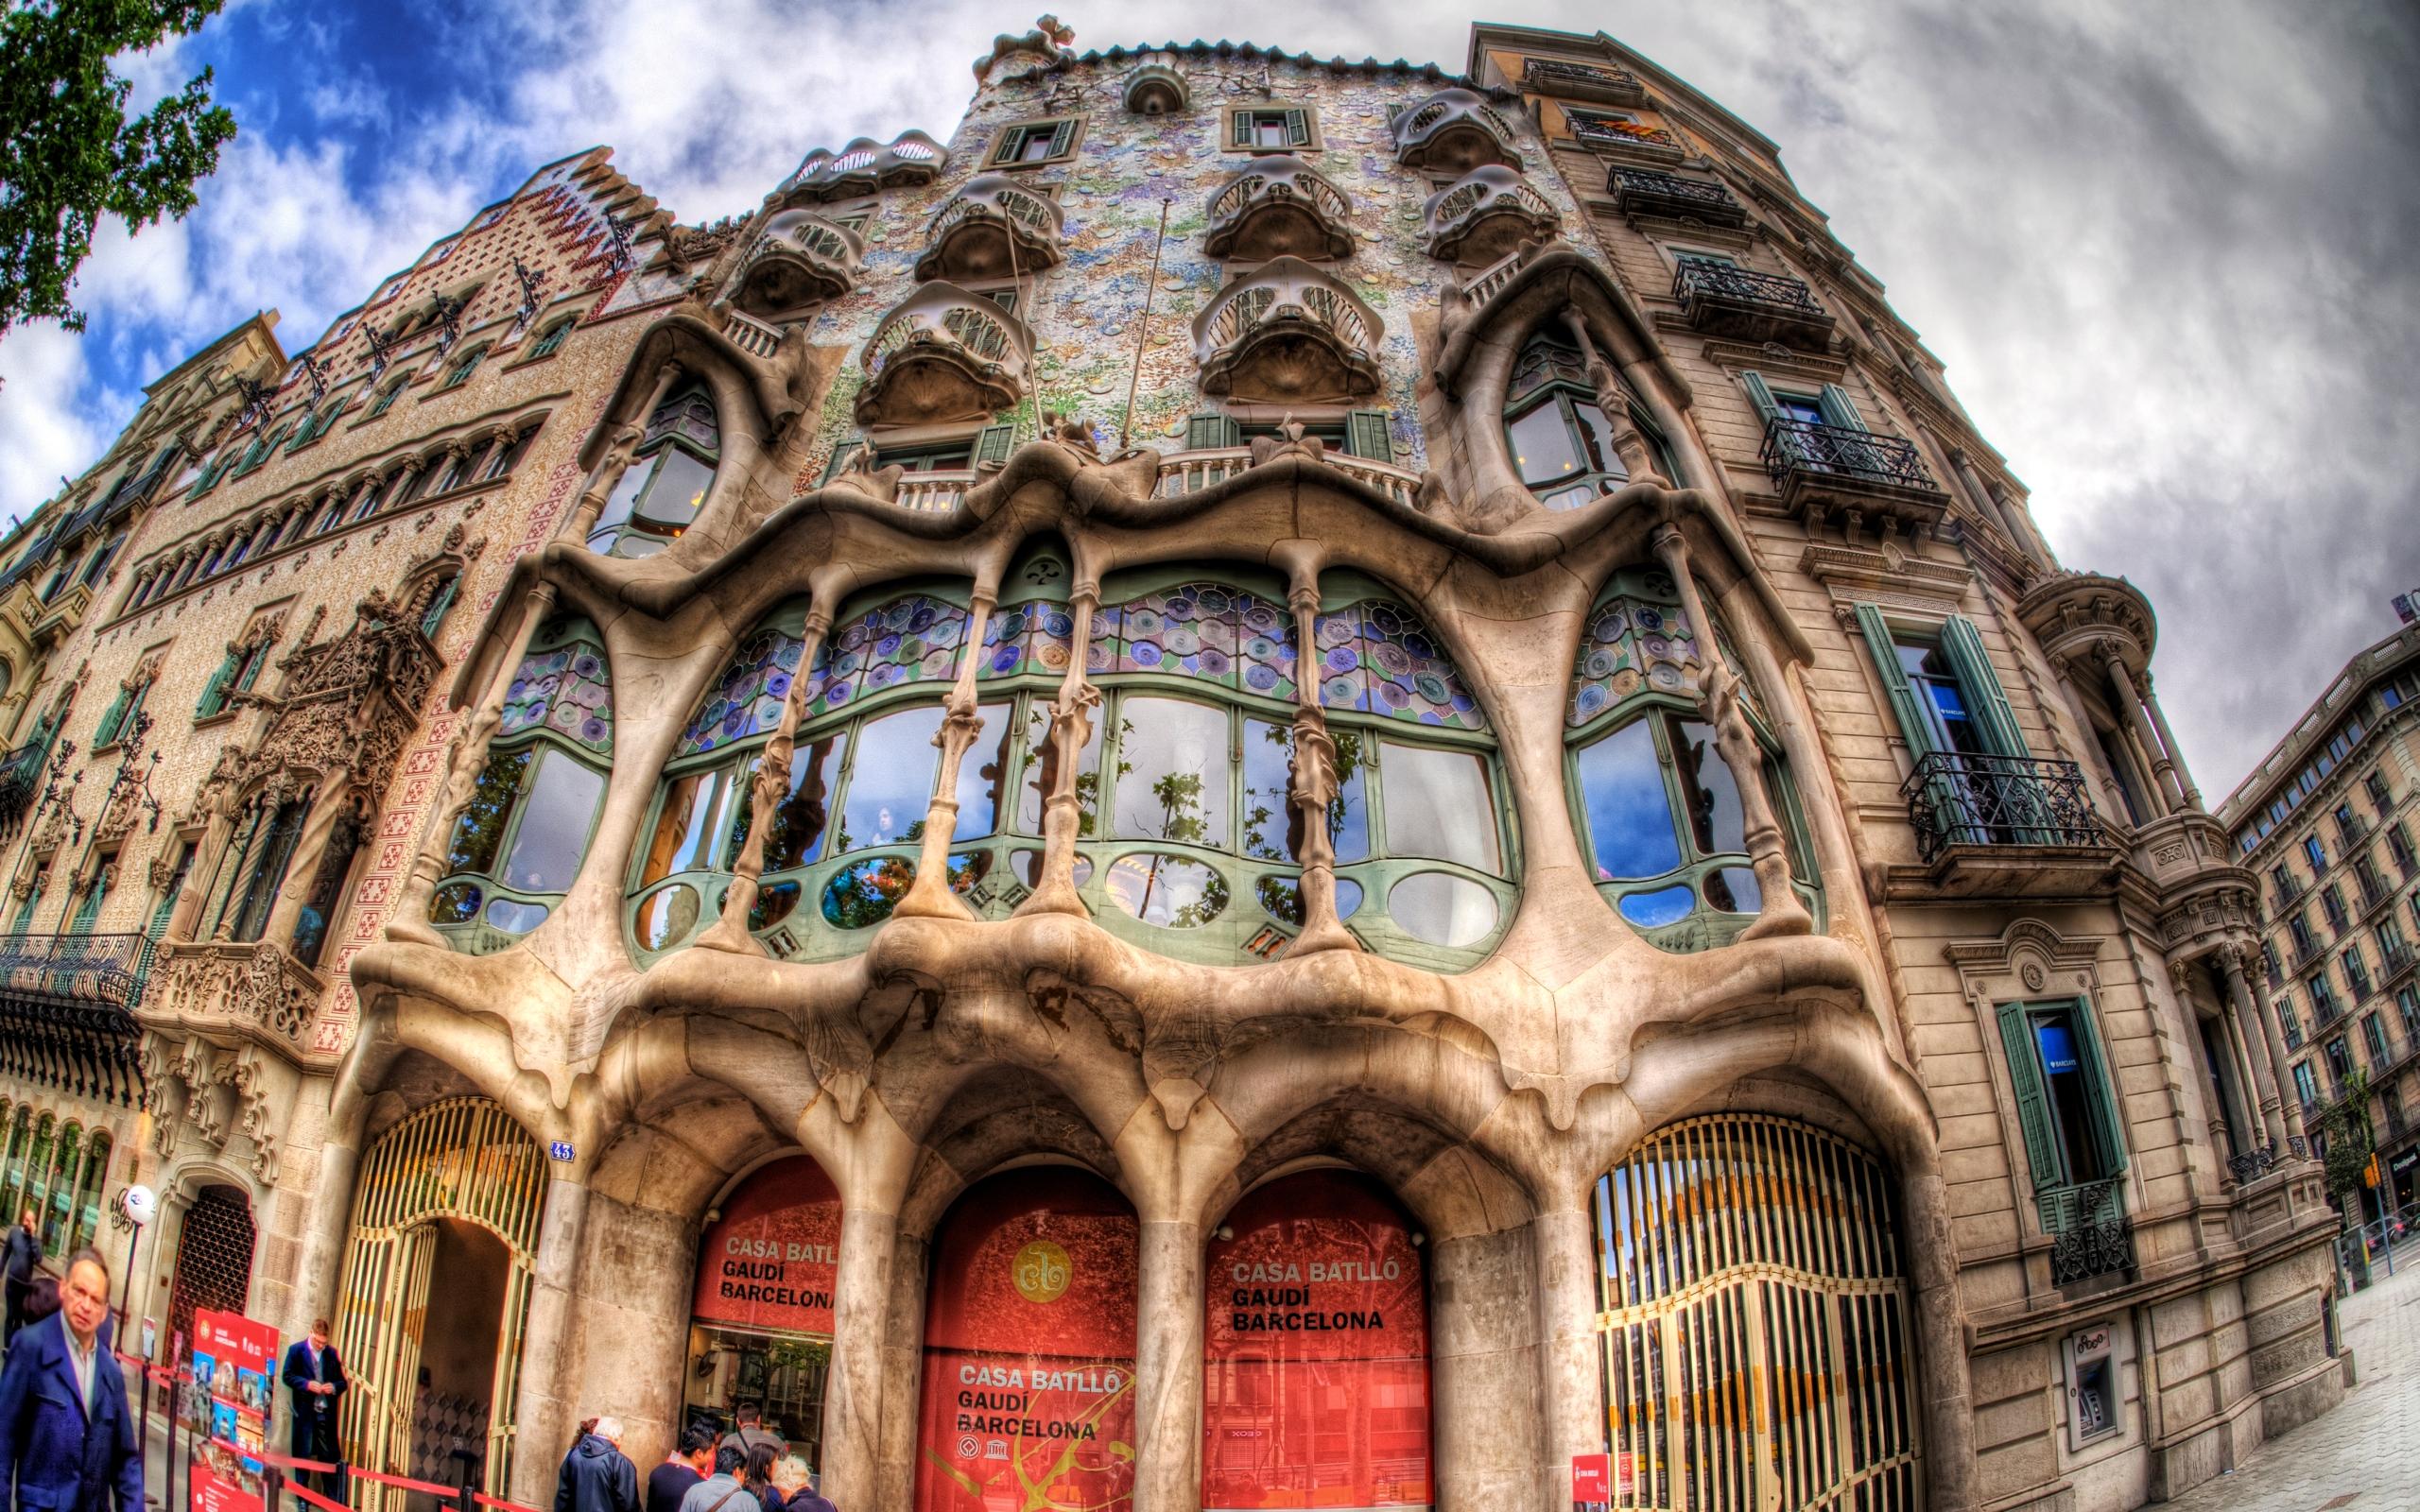 Casa Batllo In Barcelona Full HD Wallpaper And Background Image